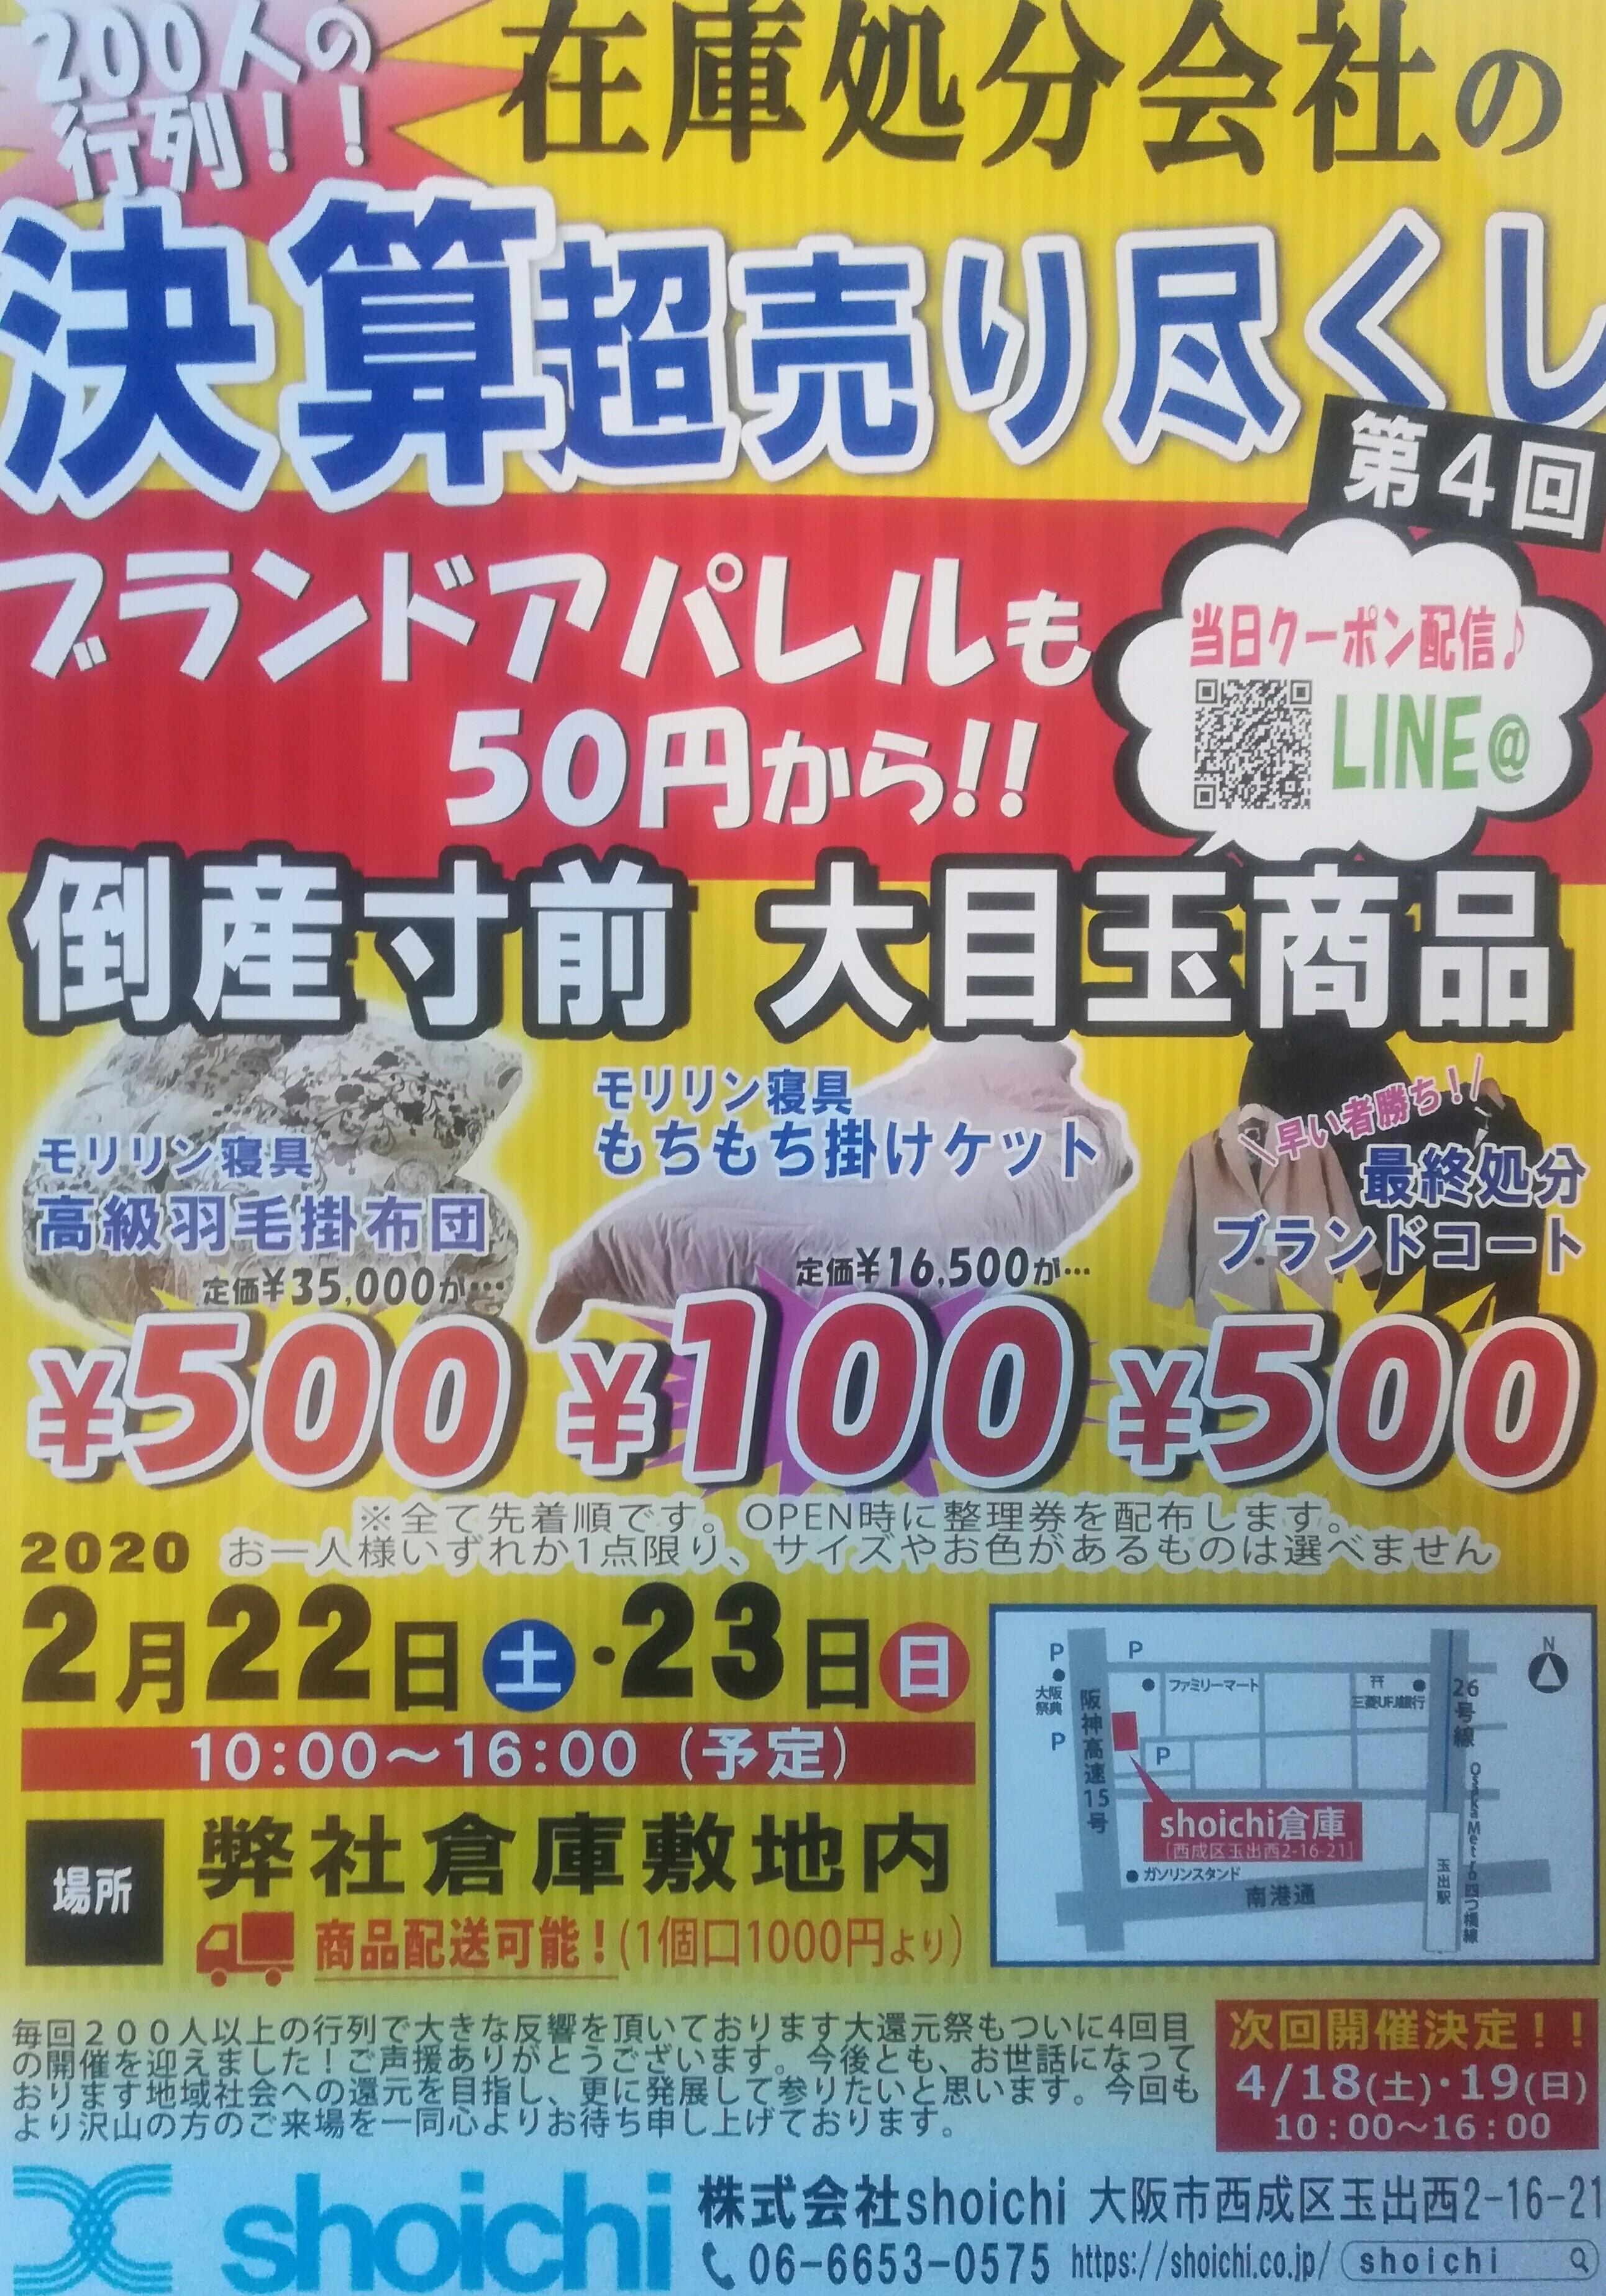 大阪 在庫処分会社 株式会社SHOICHI 決算処分セール開催